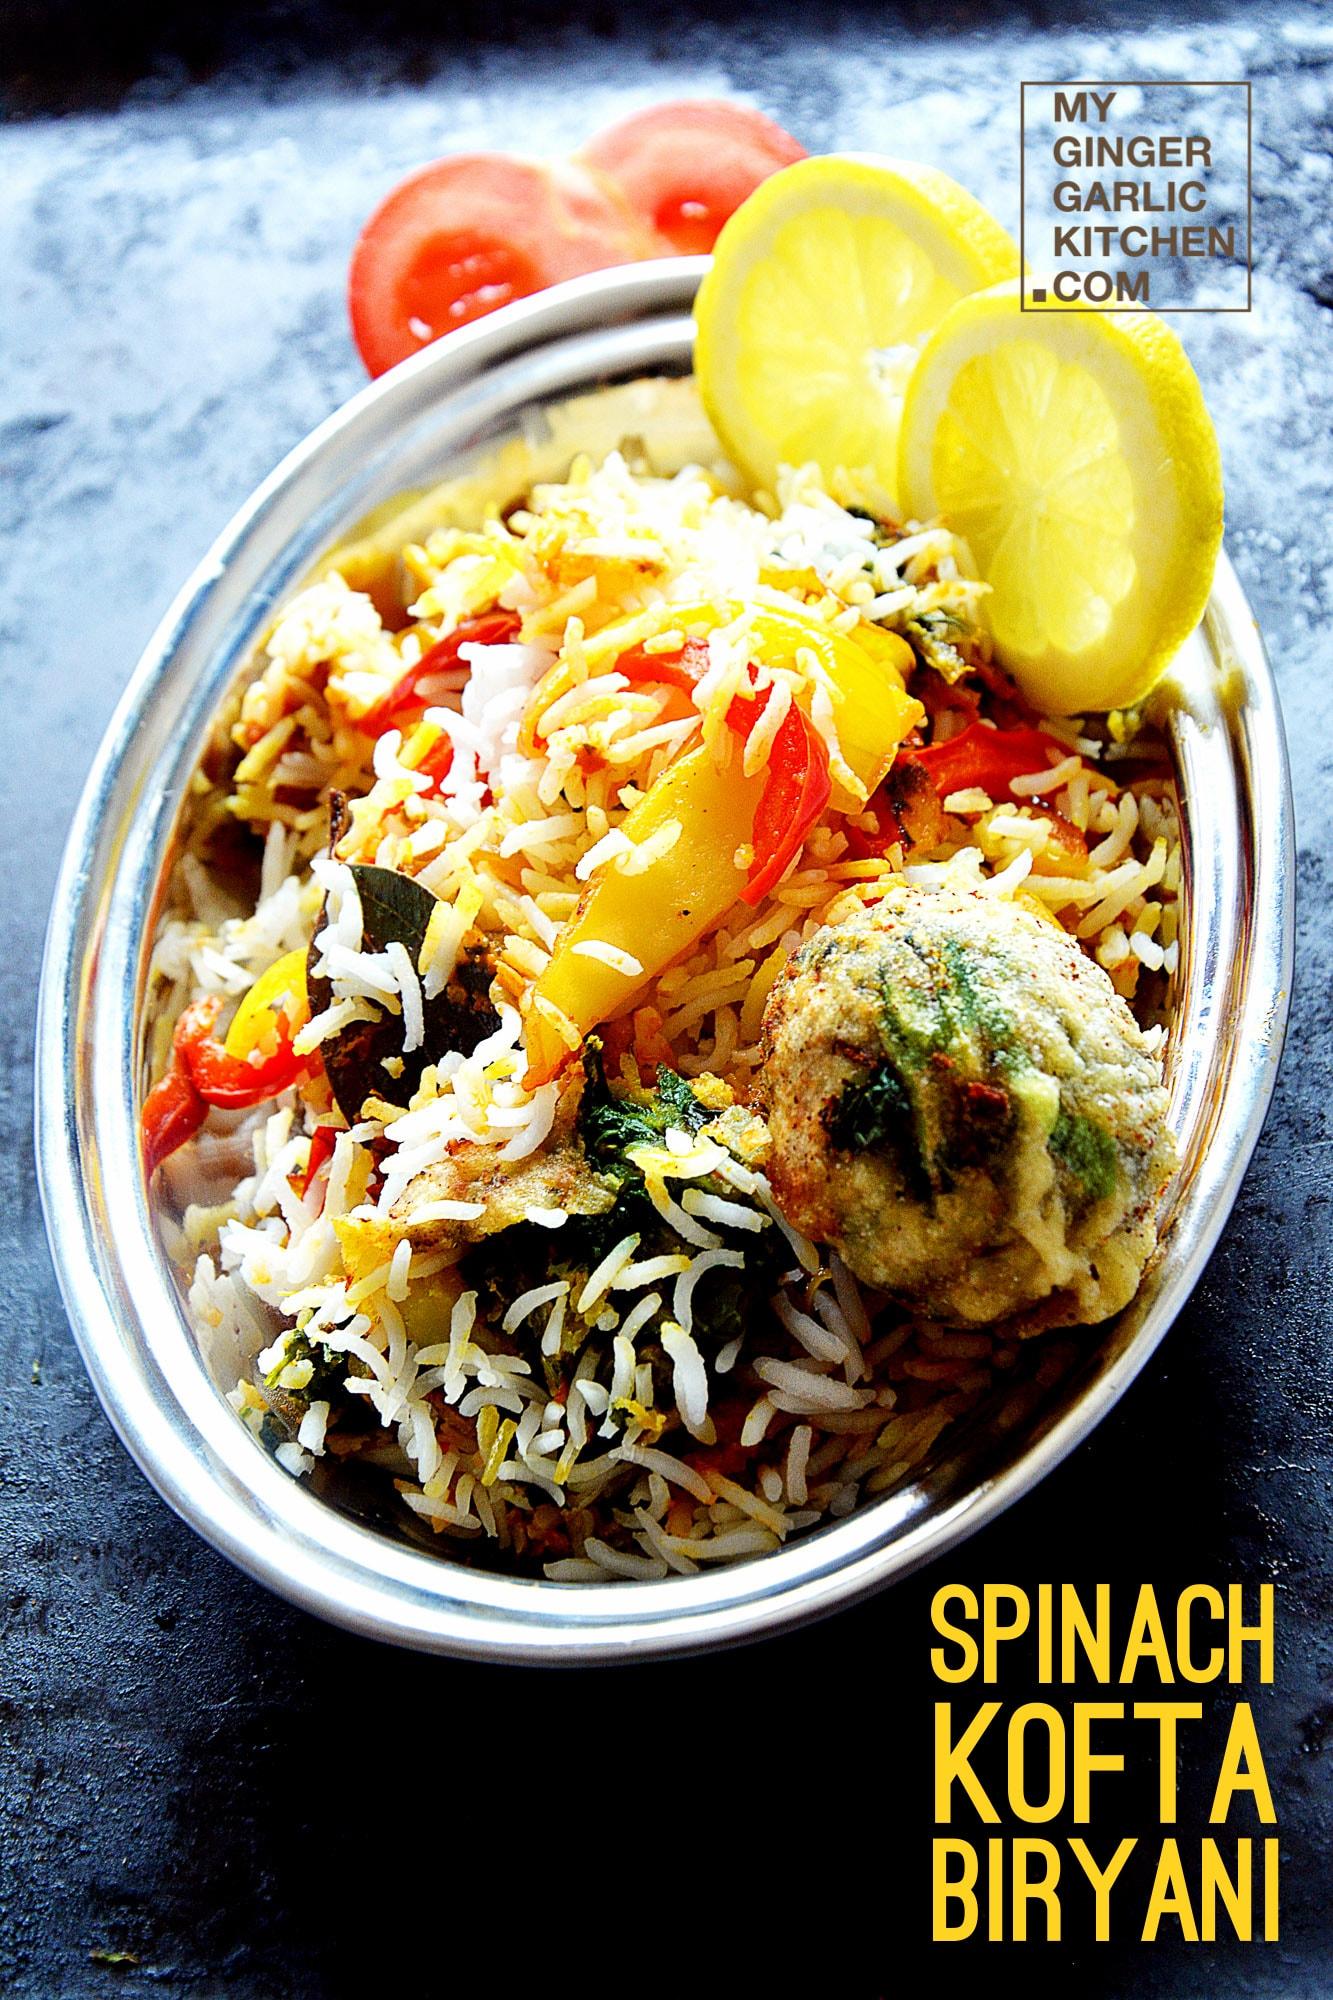 Image - recipe spinach kofta biryani anupama paliwal my ginger garlic kitchen 8